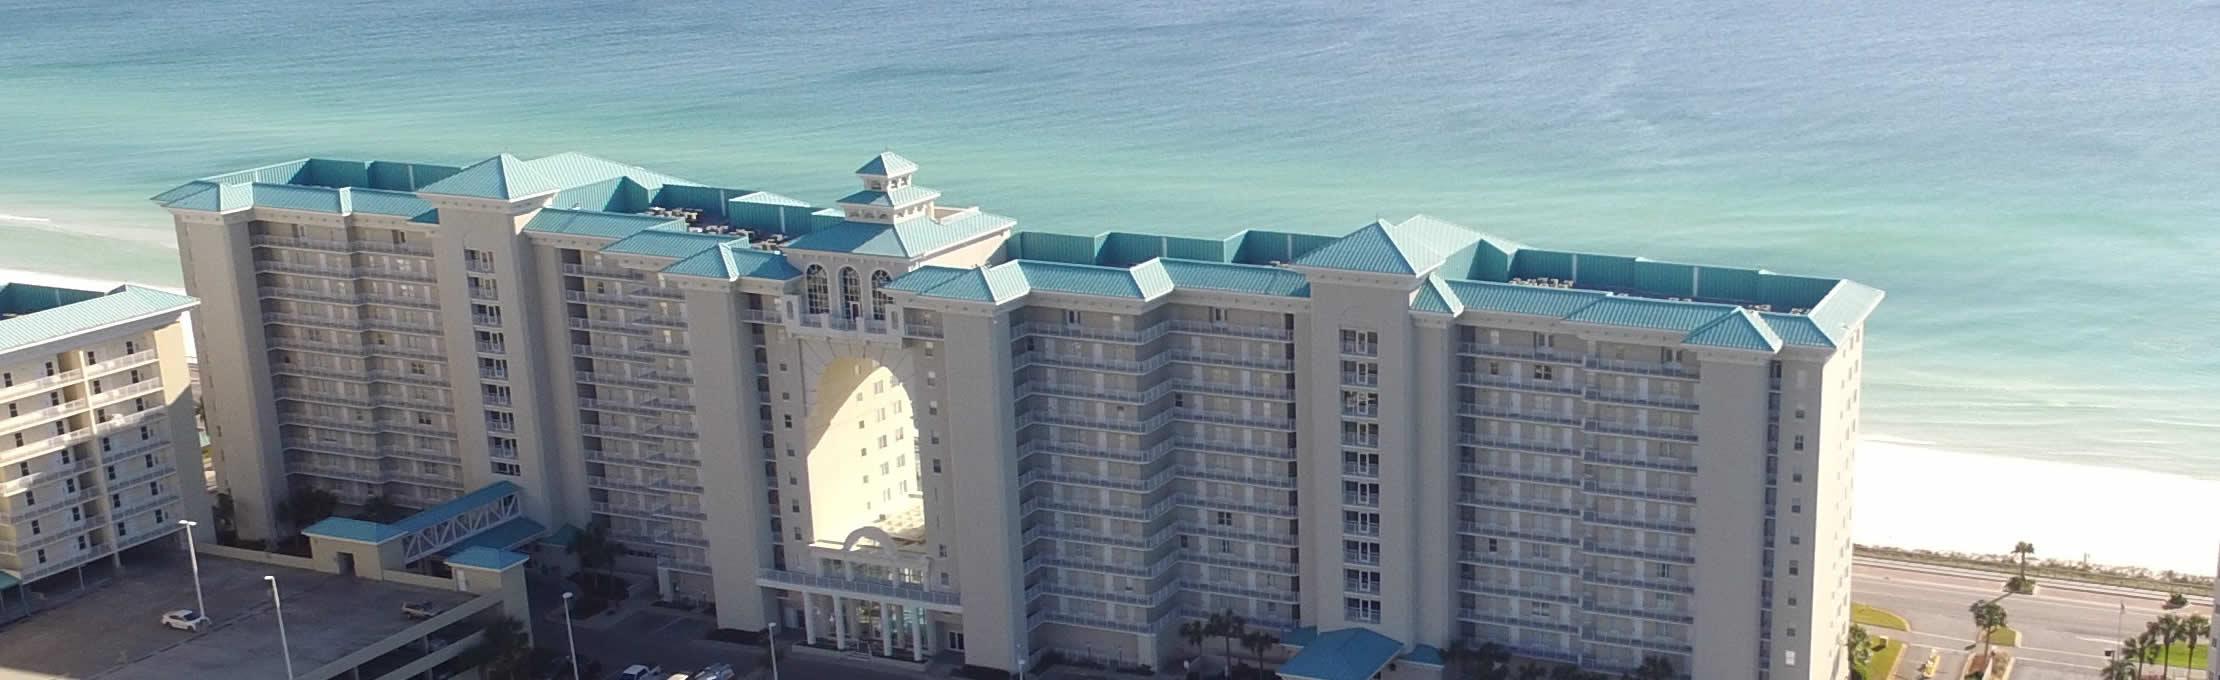 Destin Vacation Resort